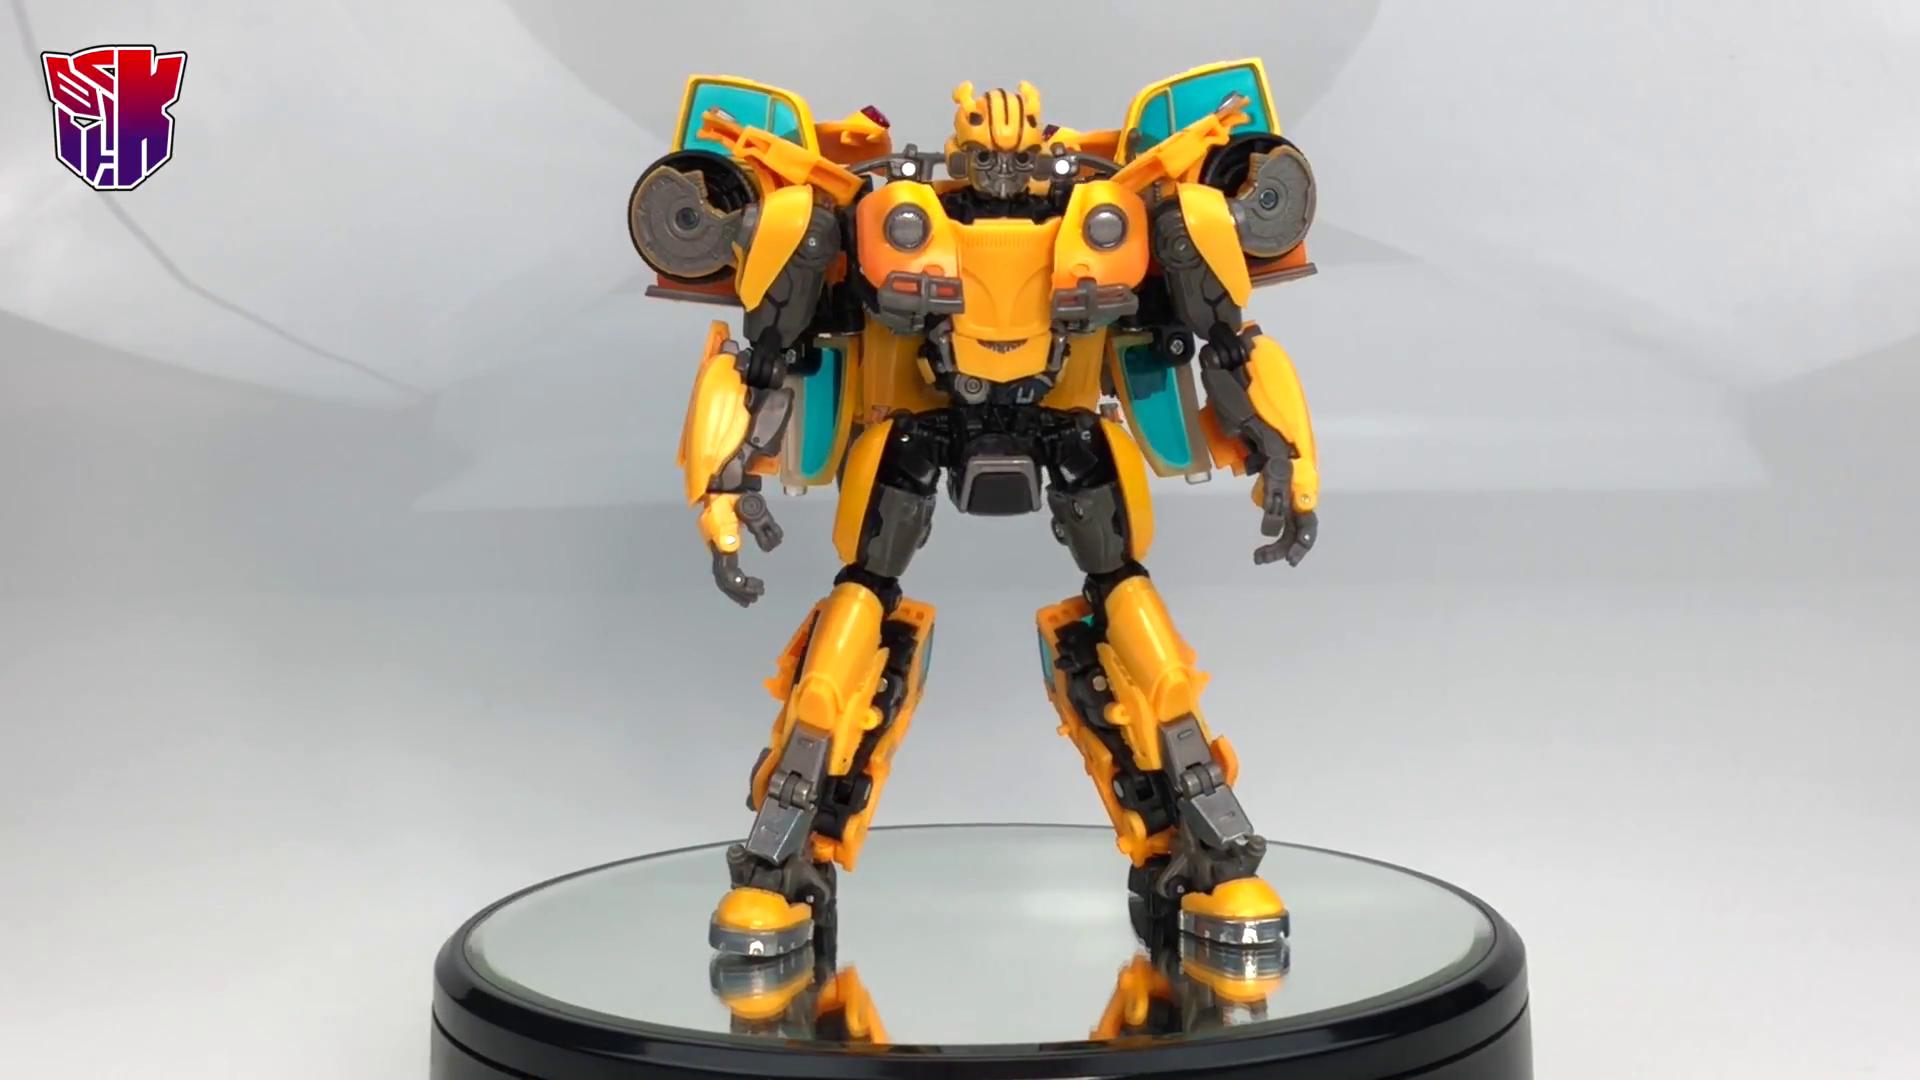 TAKARA Transformers Movie 6 MPM07 MPM-07 Beetle Bumblebee in stock